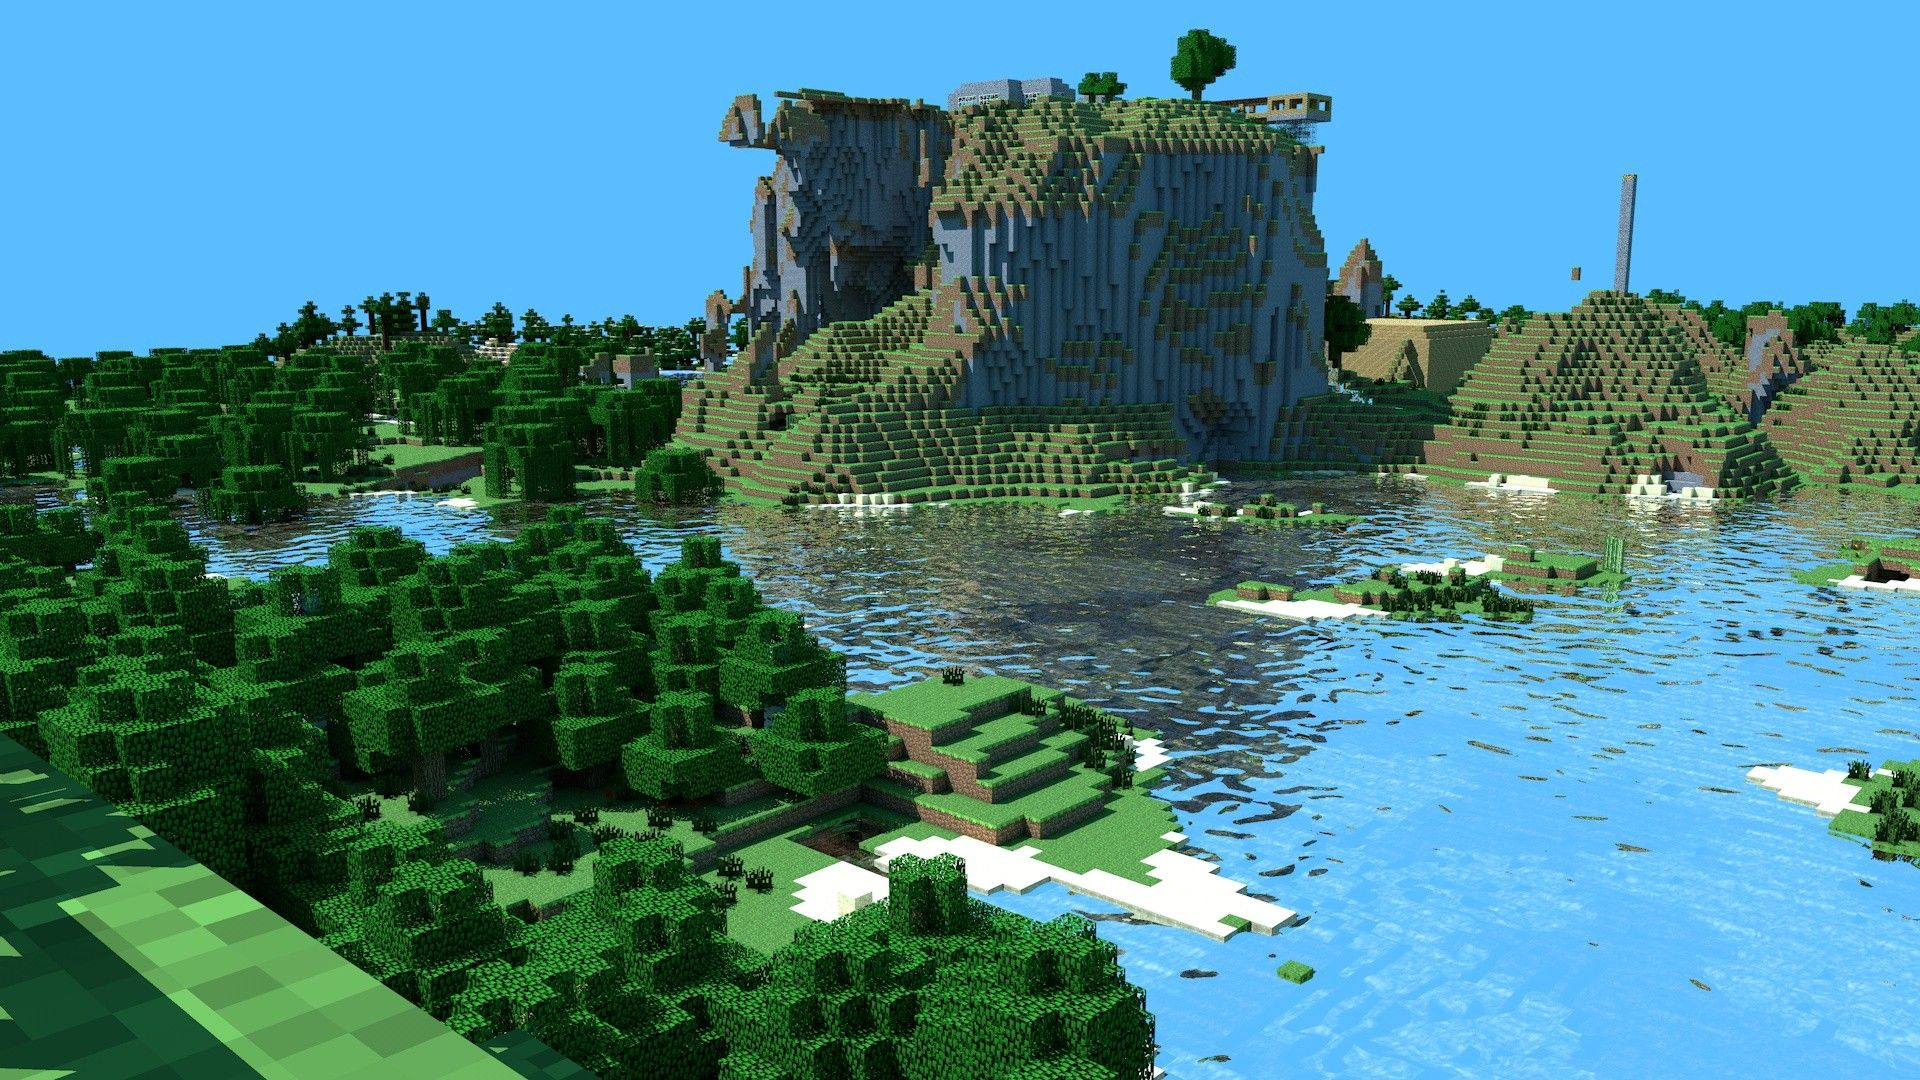 Hd Minecraft Background Page 1